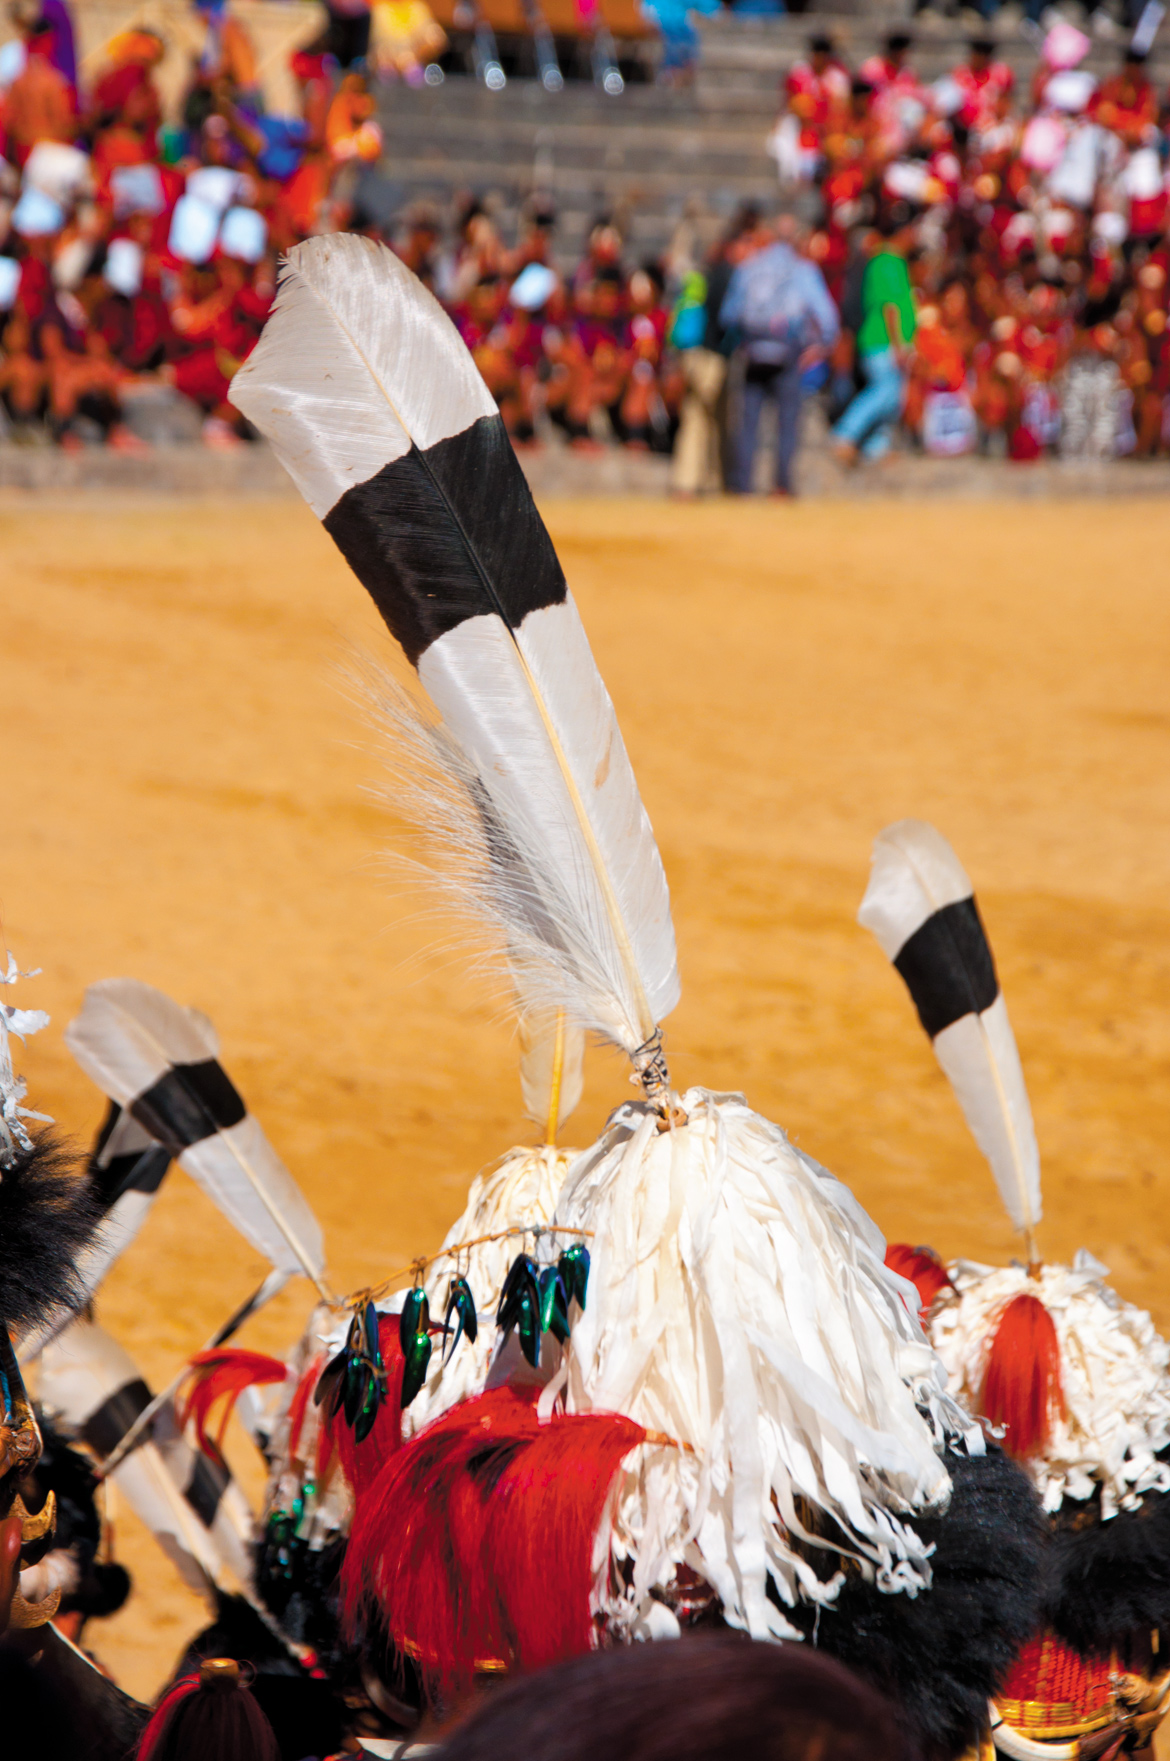 Hornbill feathers adorn tribal headgear